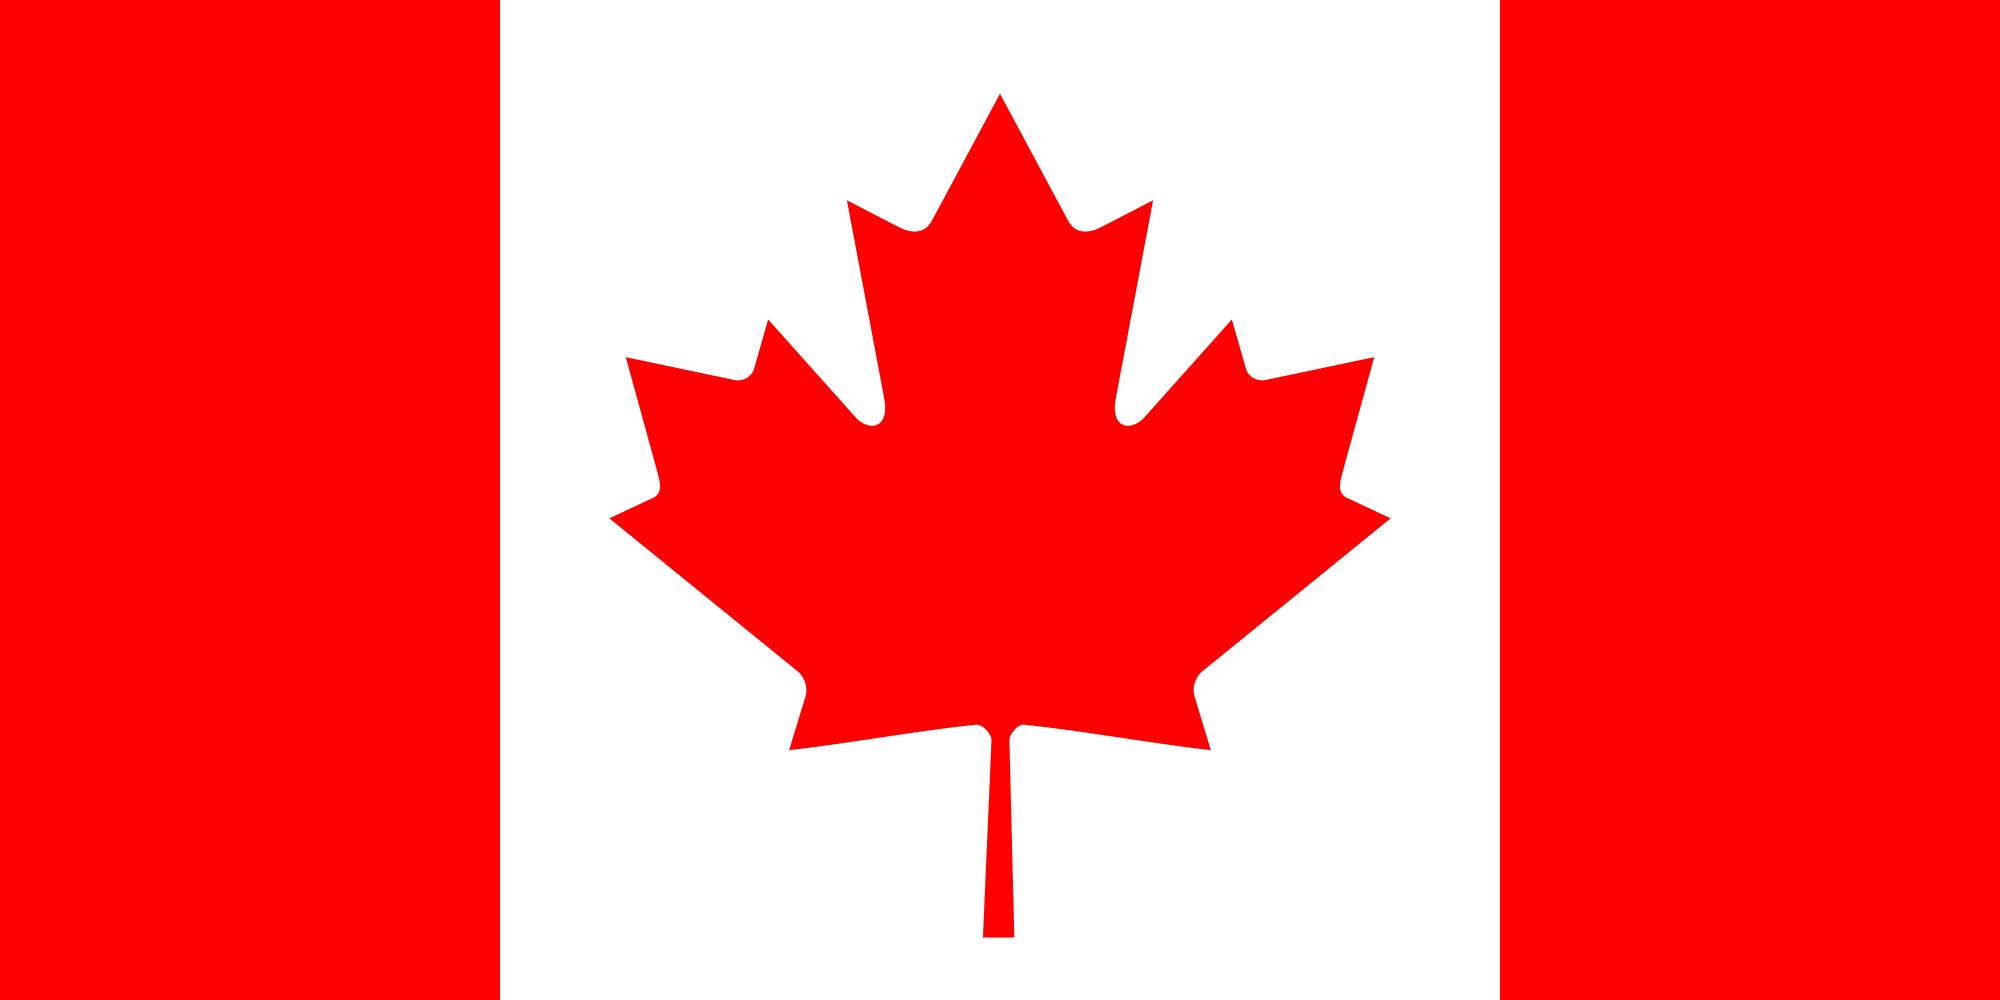 Image cj gtav transparent png gta wiki the grand theft auto wiki - Flag Of Canada Flag Of Canada